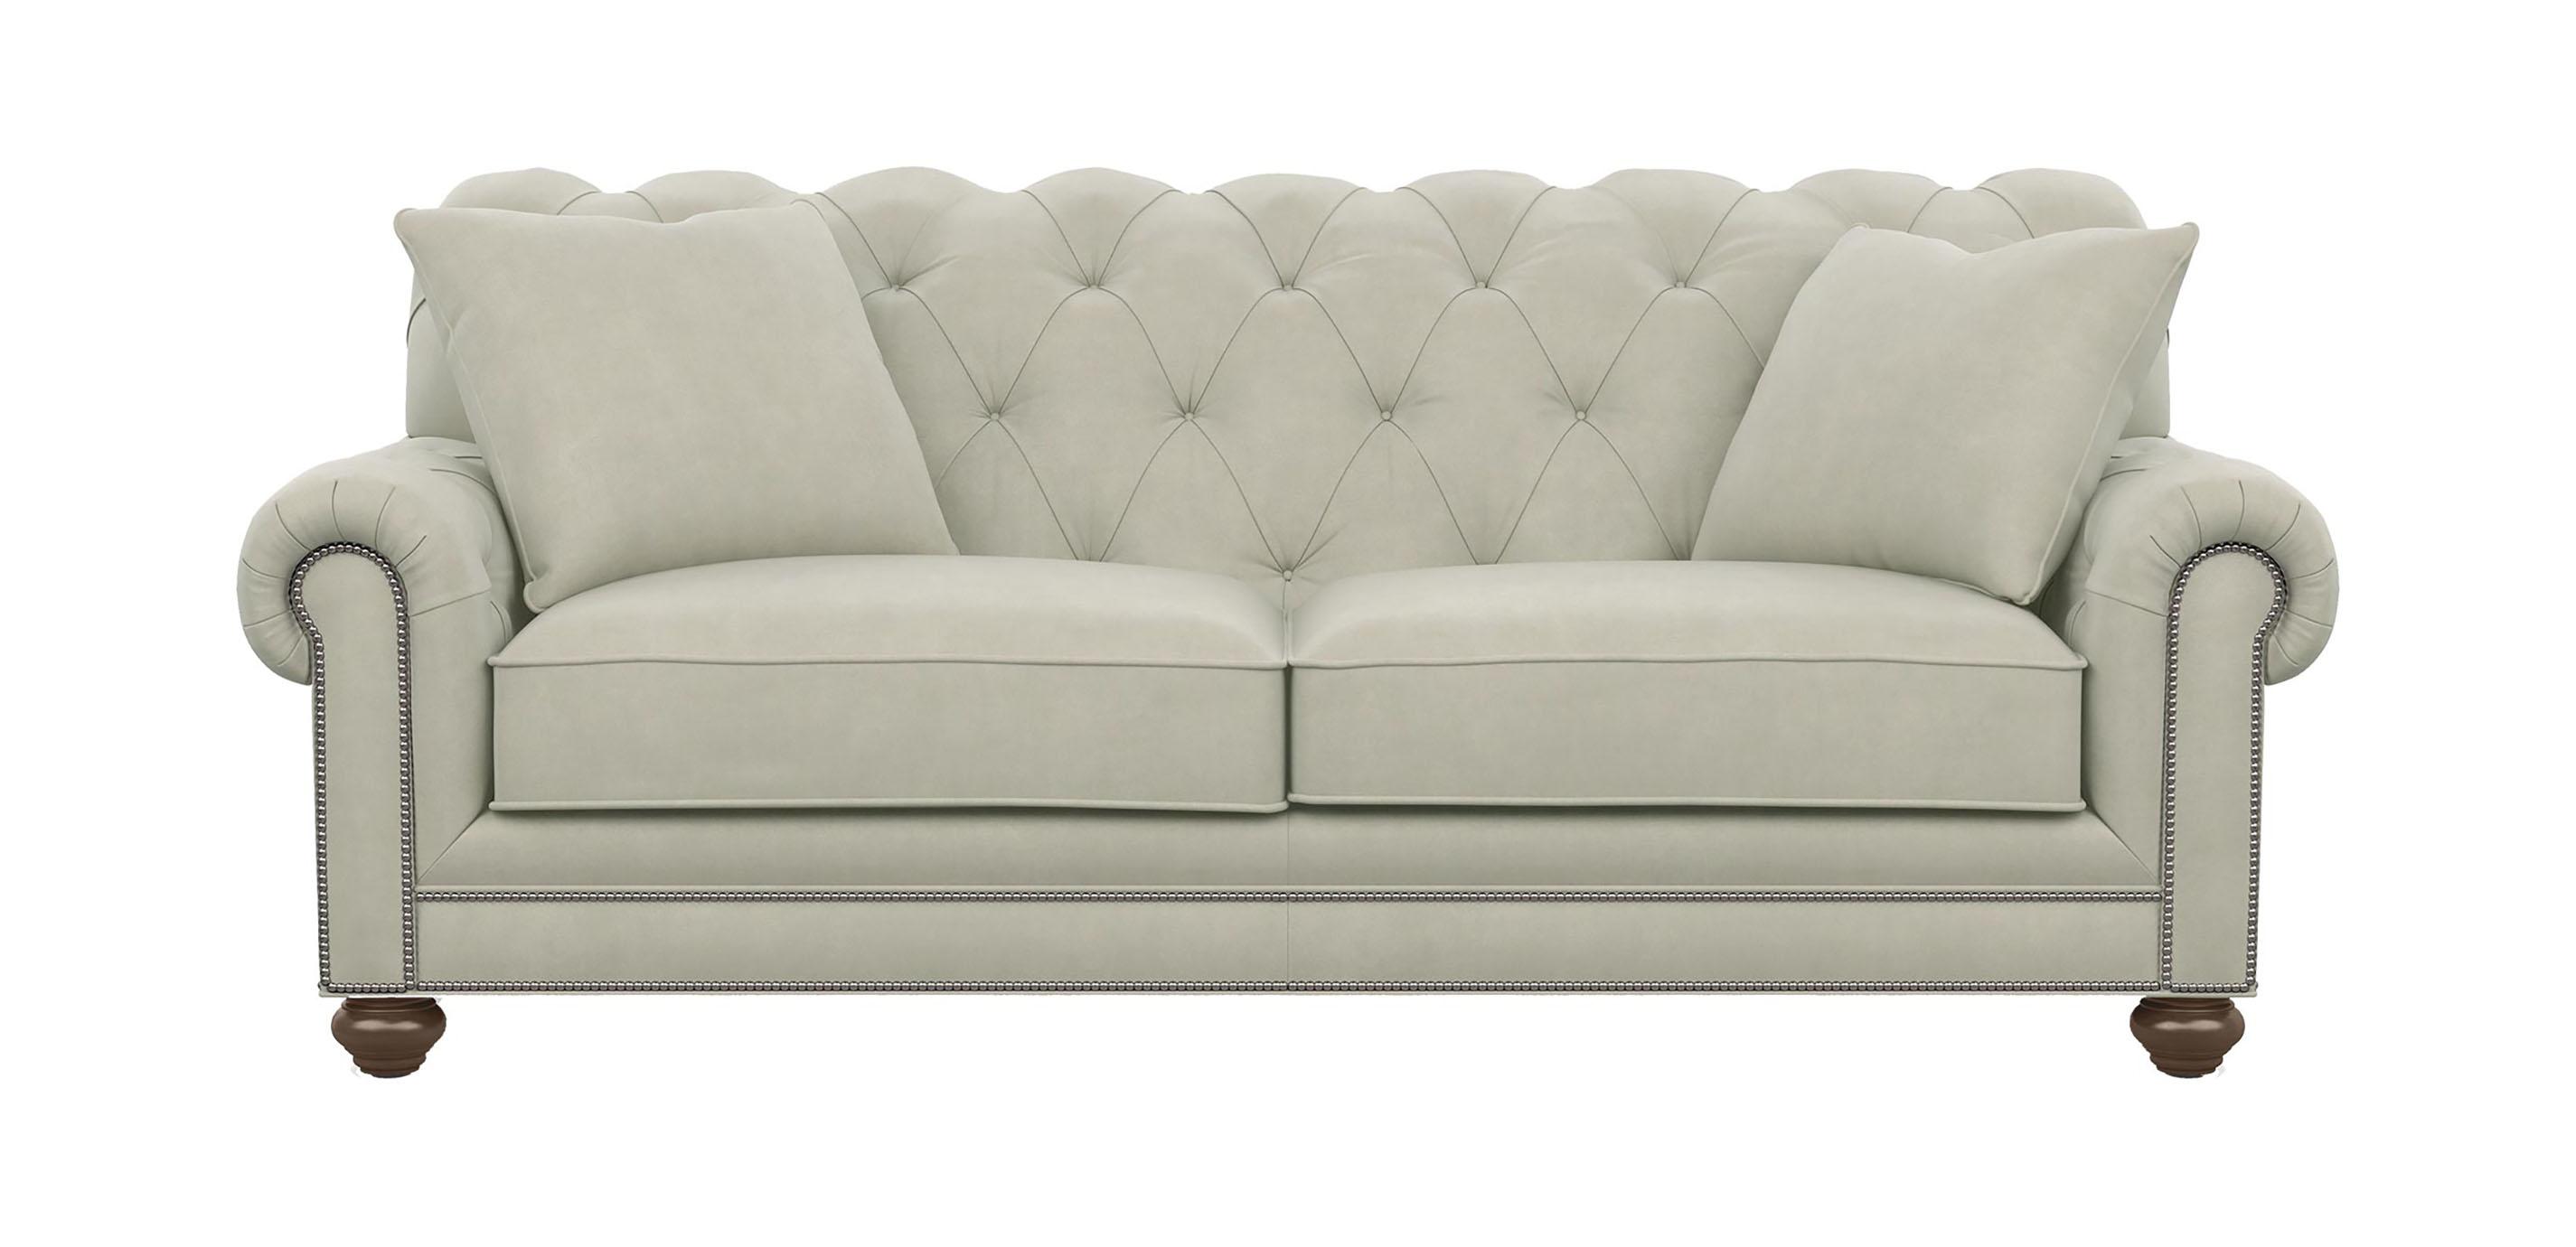 Sofa Sofas Loveseats Ethan Allen